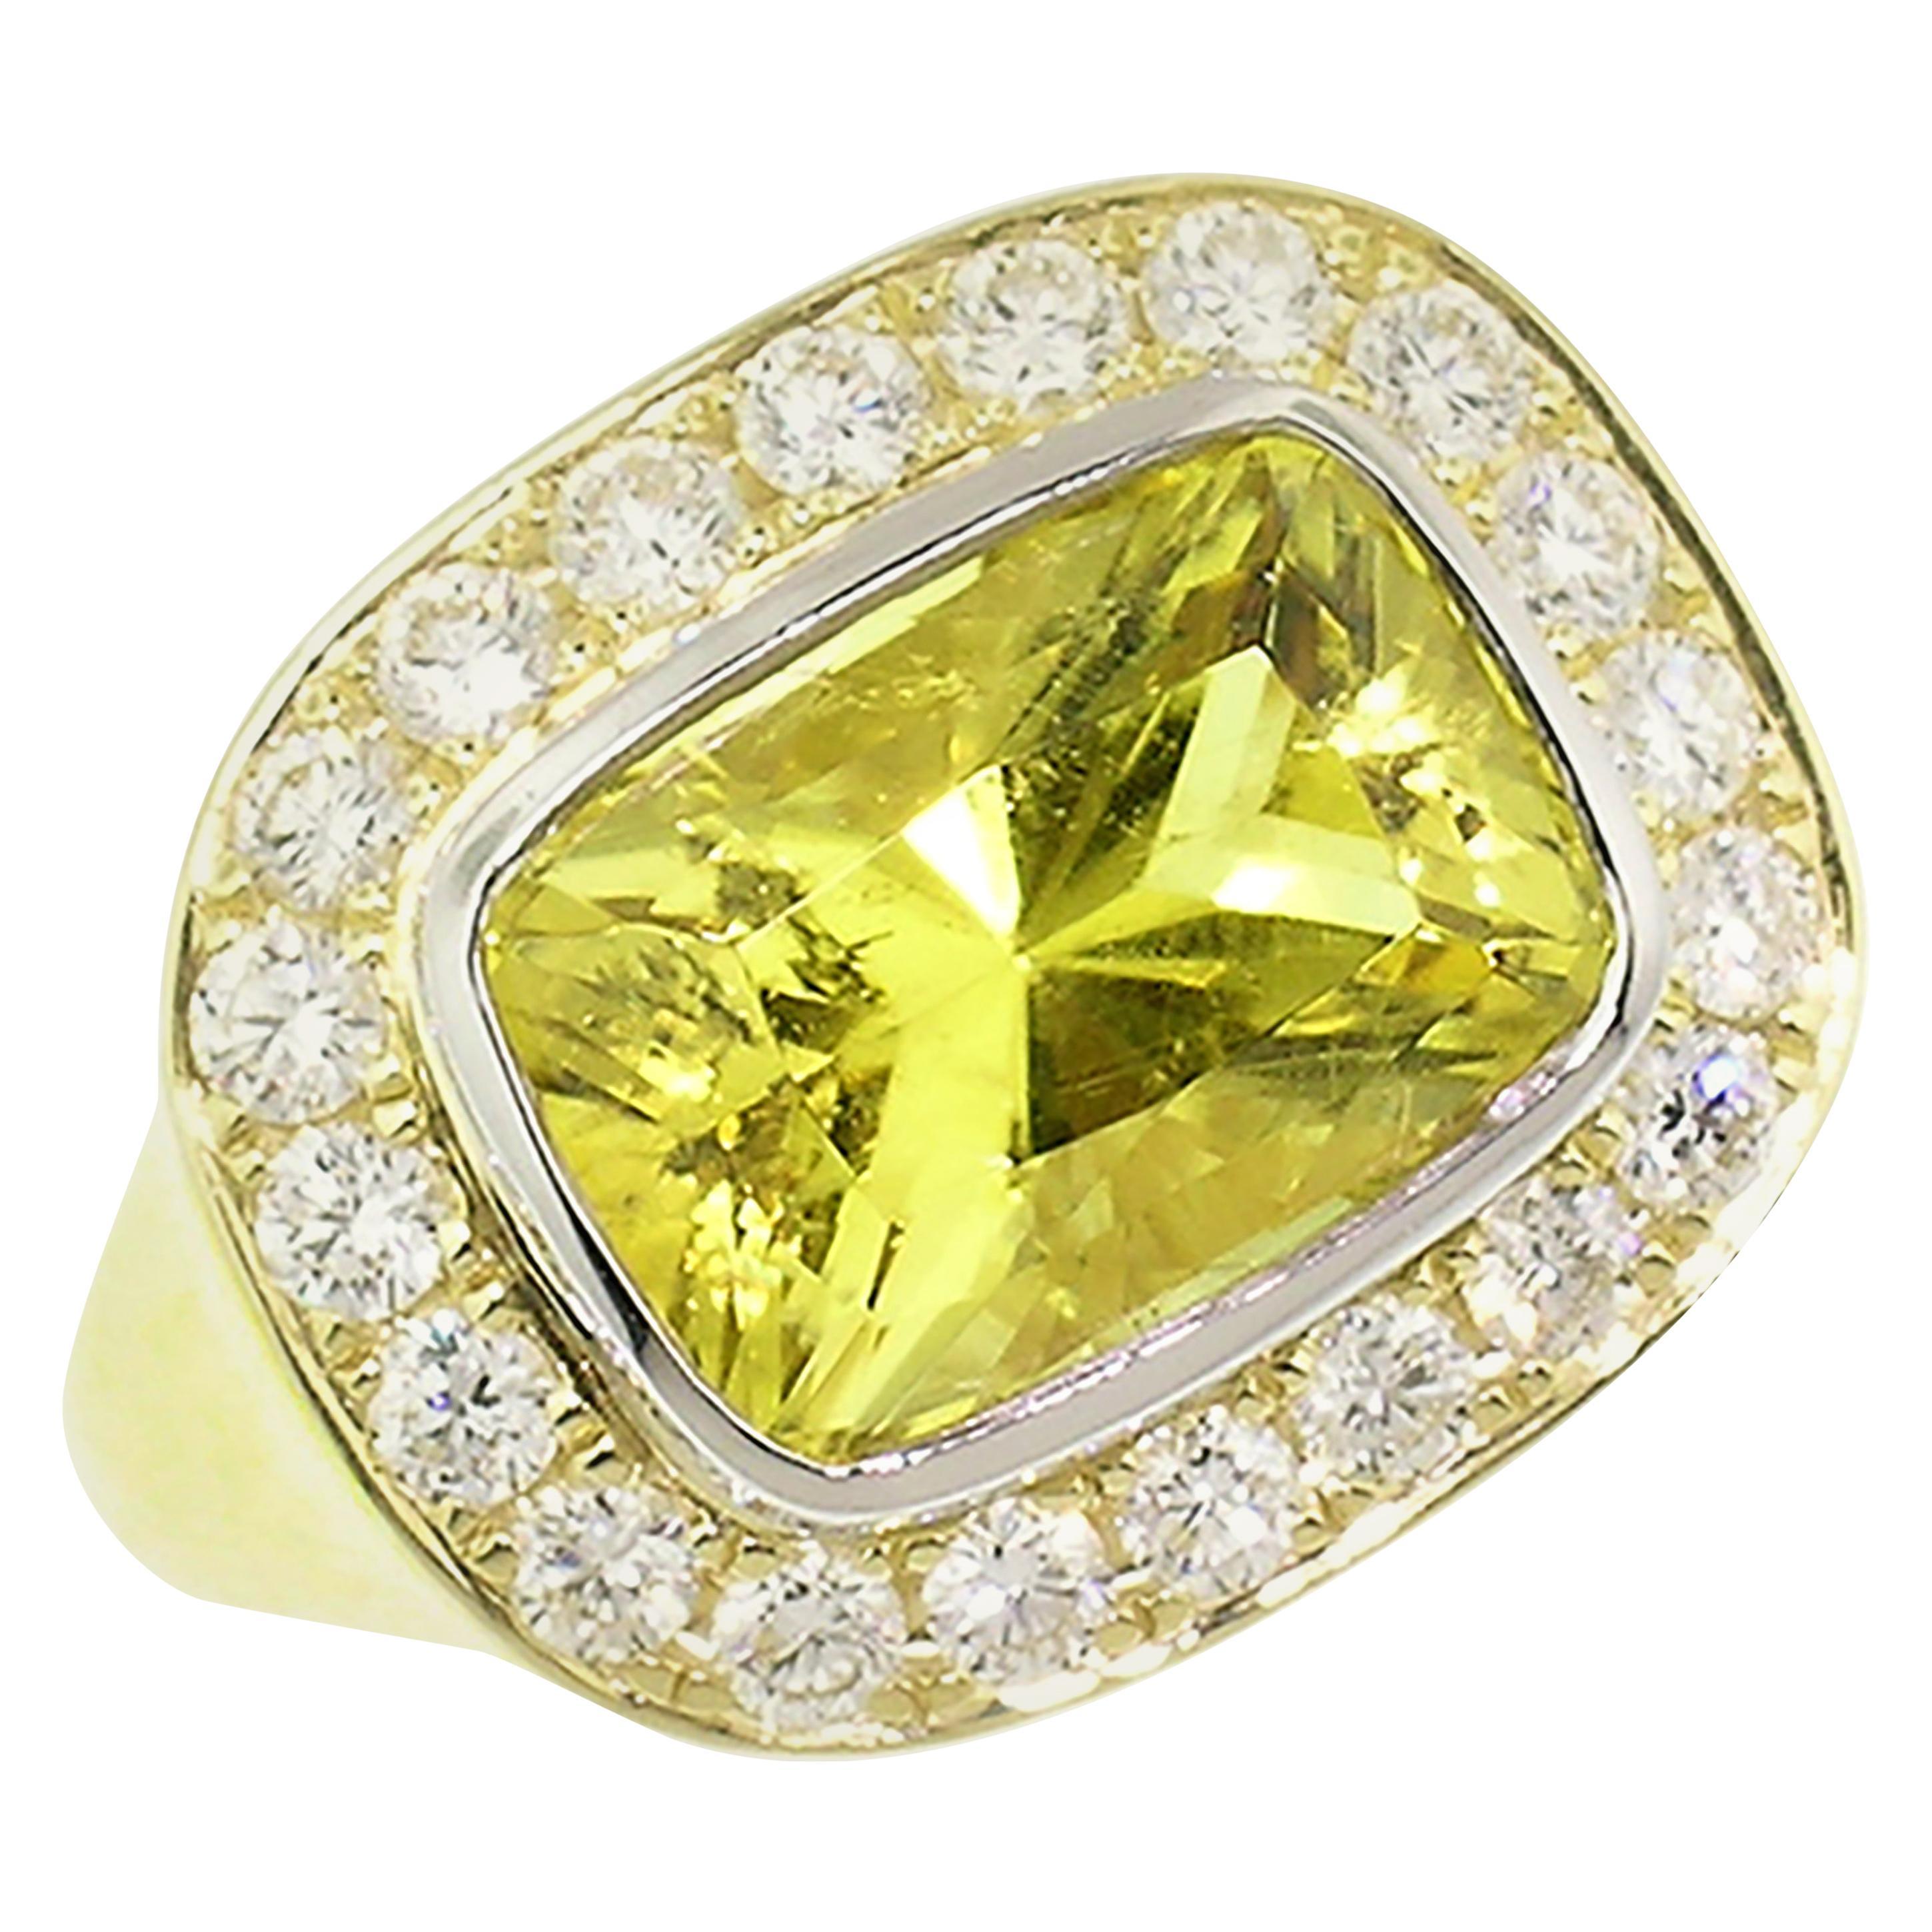 Cynthia Scott 4.57 carat Canary Yellow Tourmaline Aphrodite Ring, GIA Report